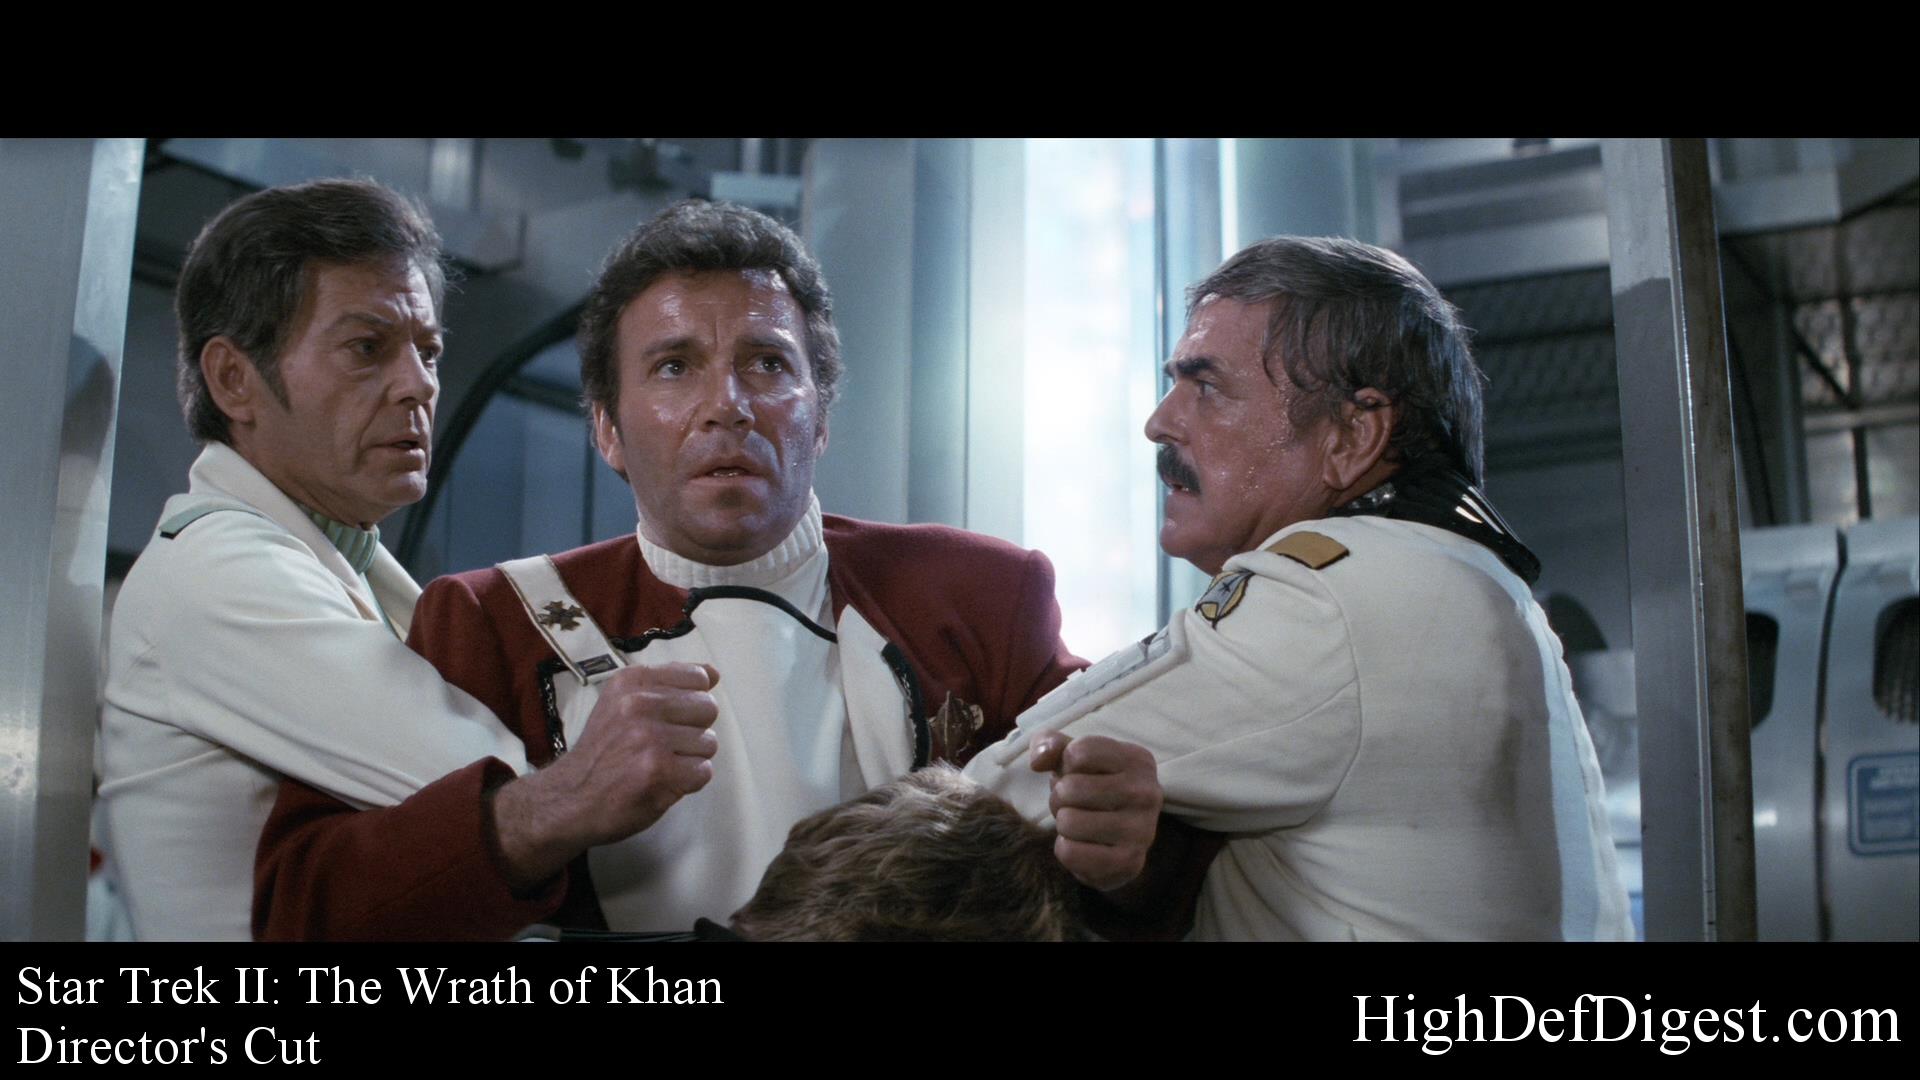 Star Trek: The Wrath of Khan - Comparison 3 (Director's Cut)